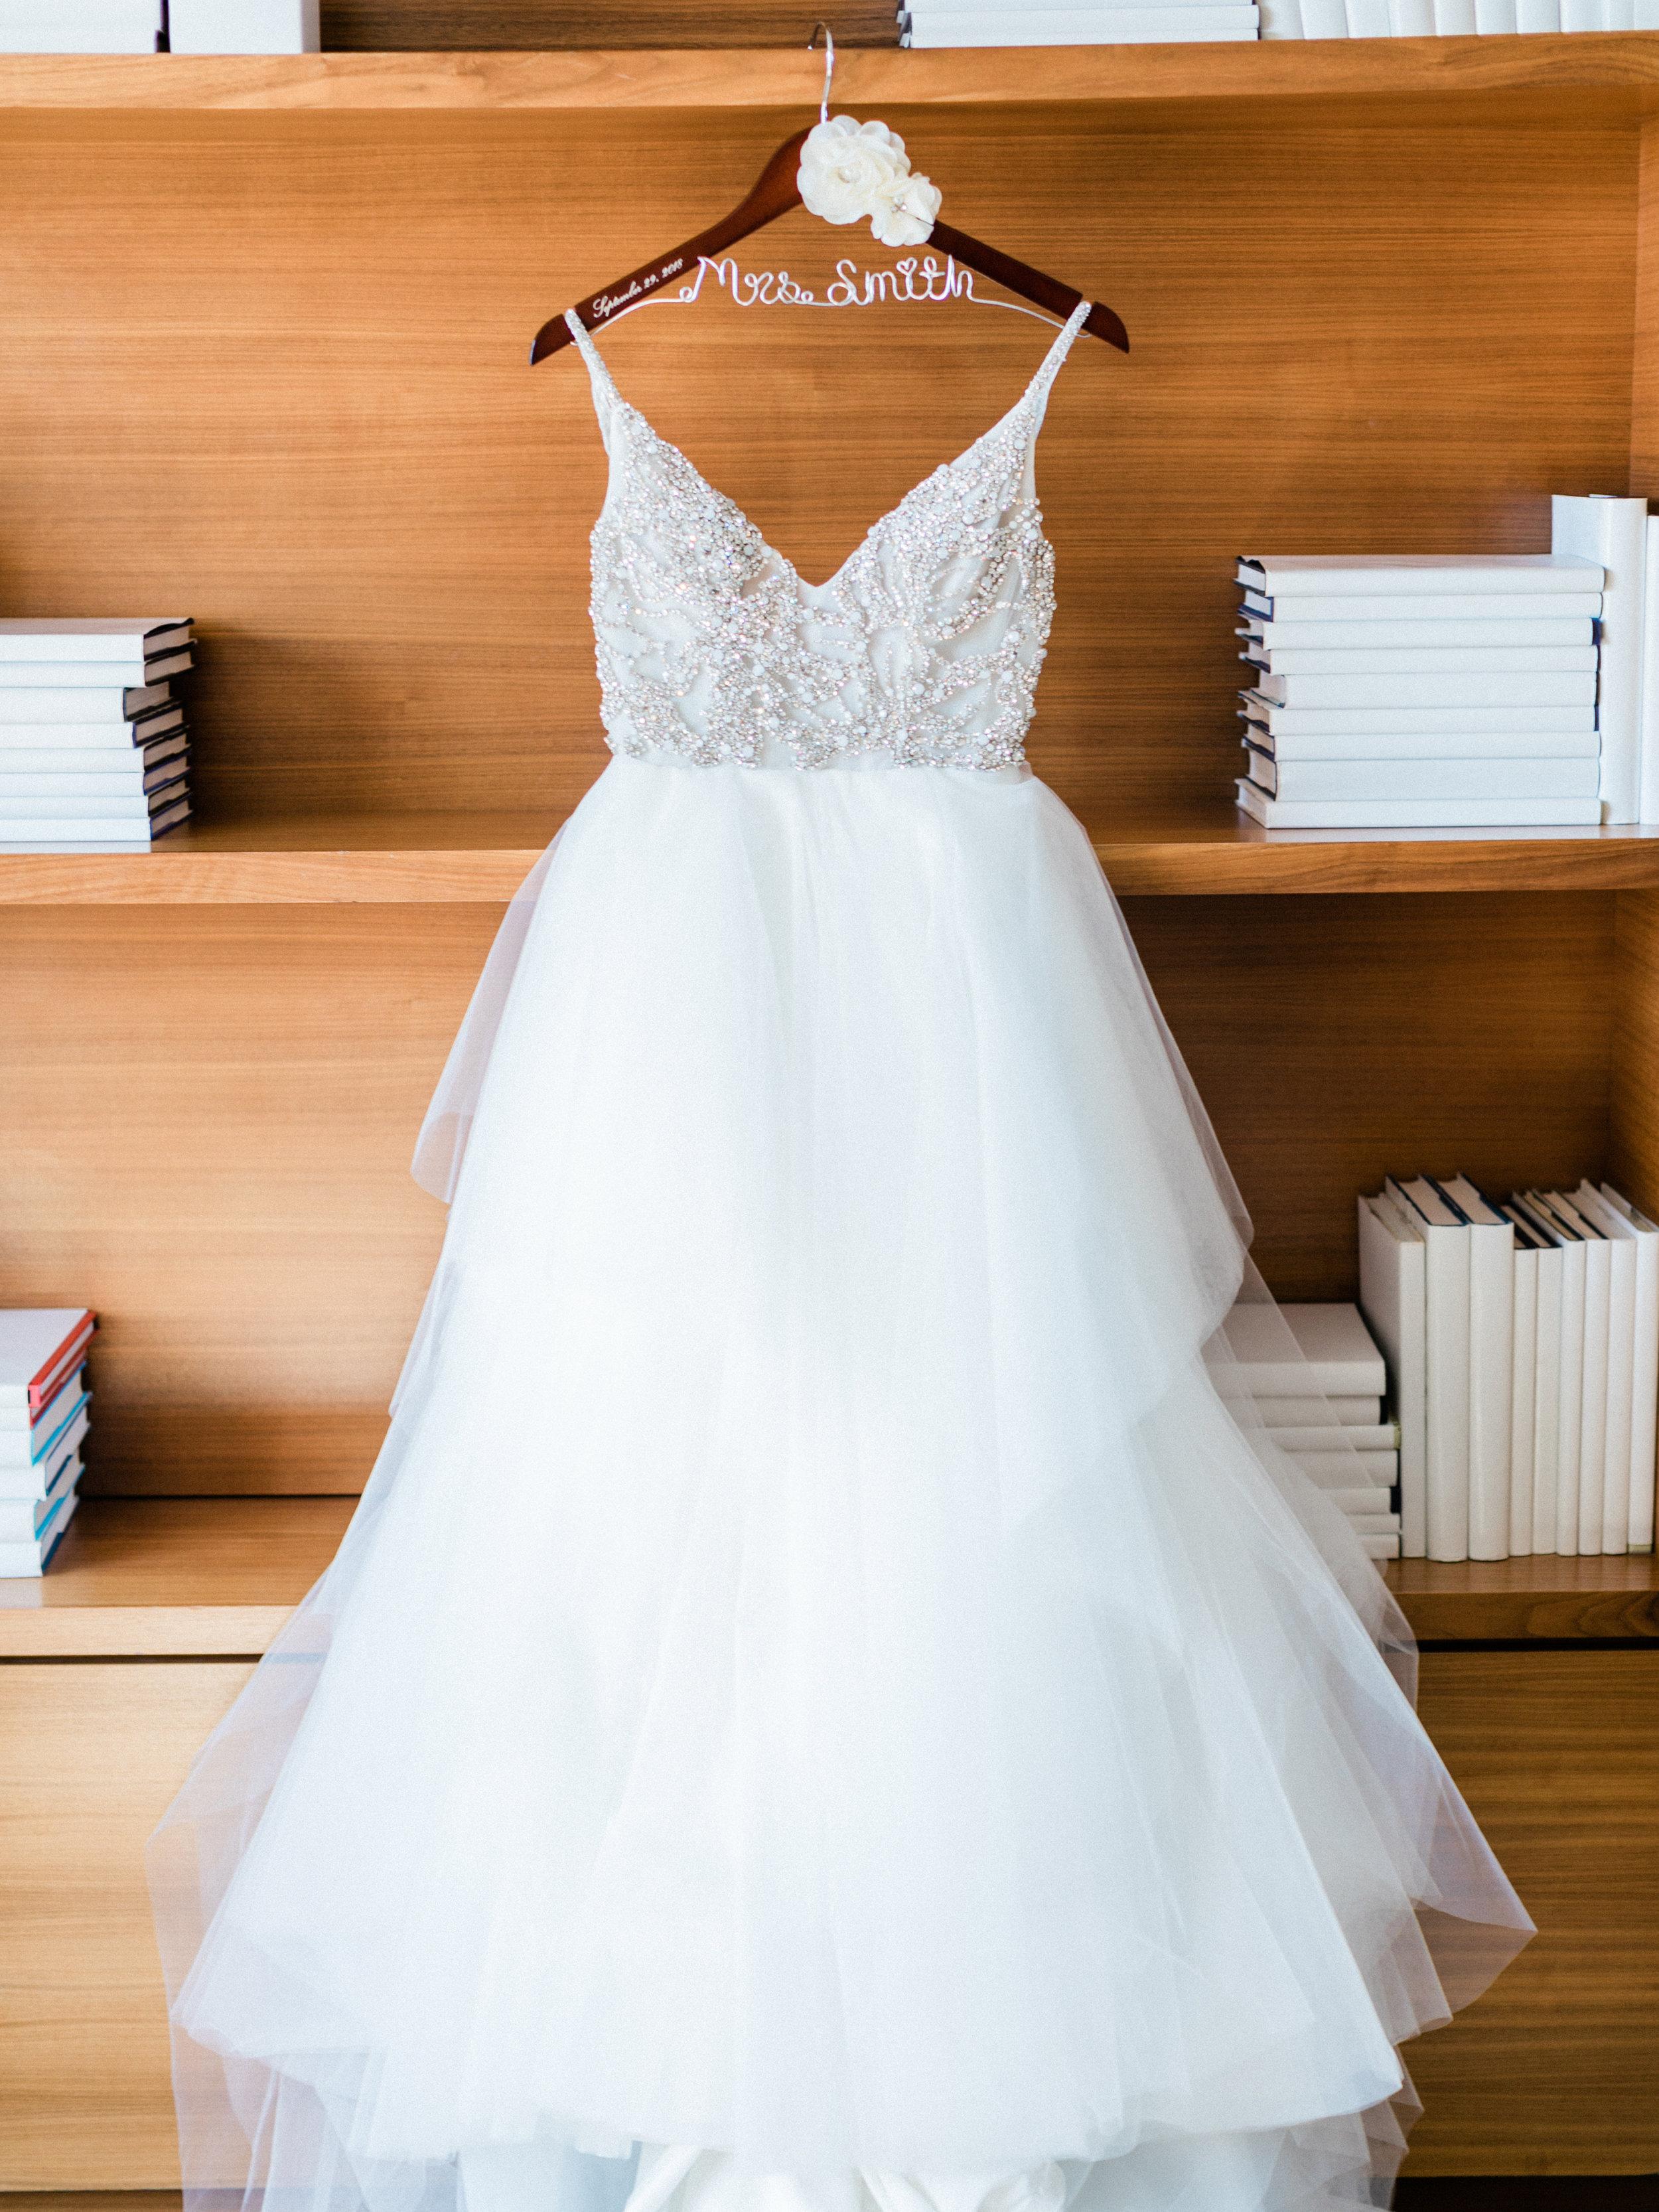 hyatt-regency-jersey-city-wedding-photographer10.jpg